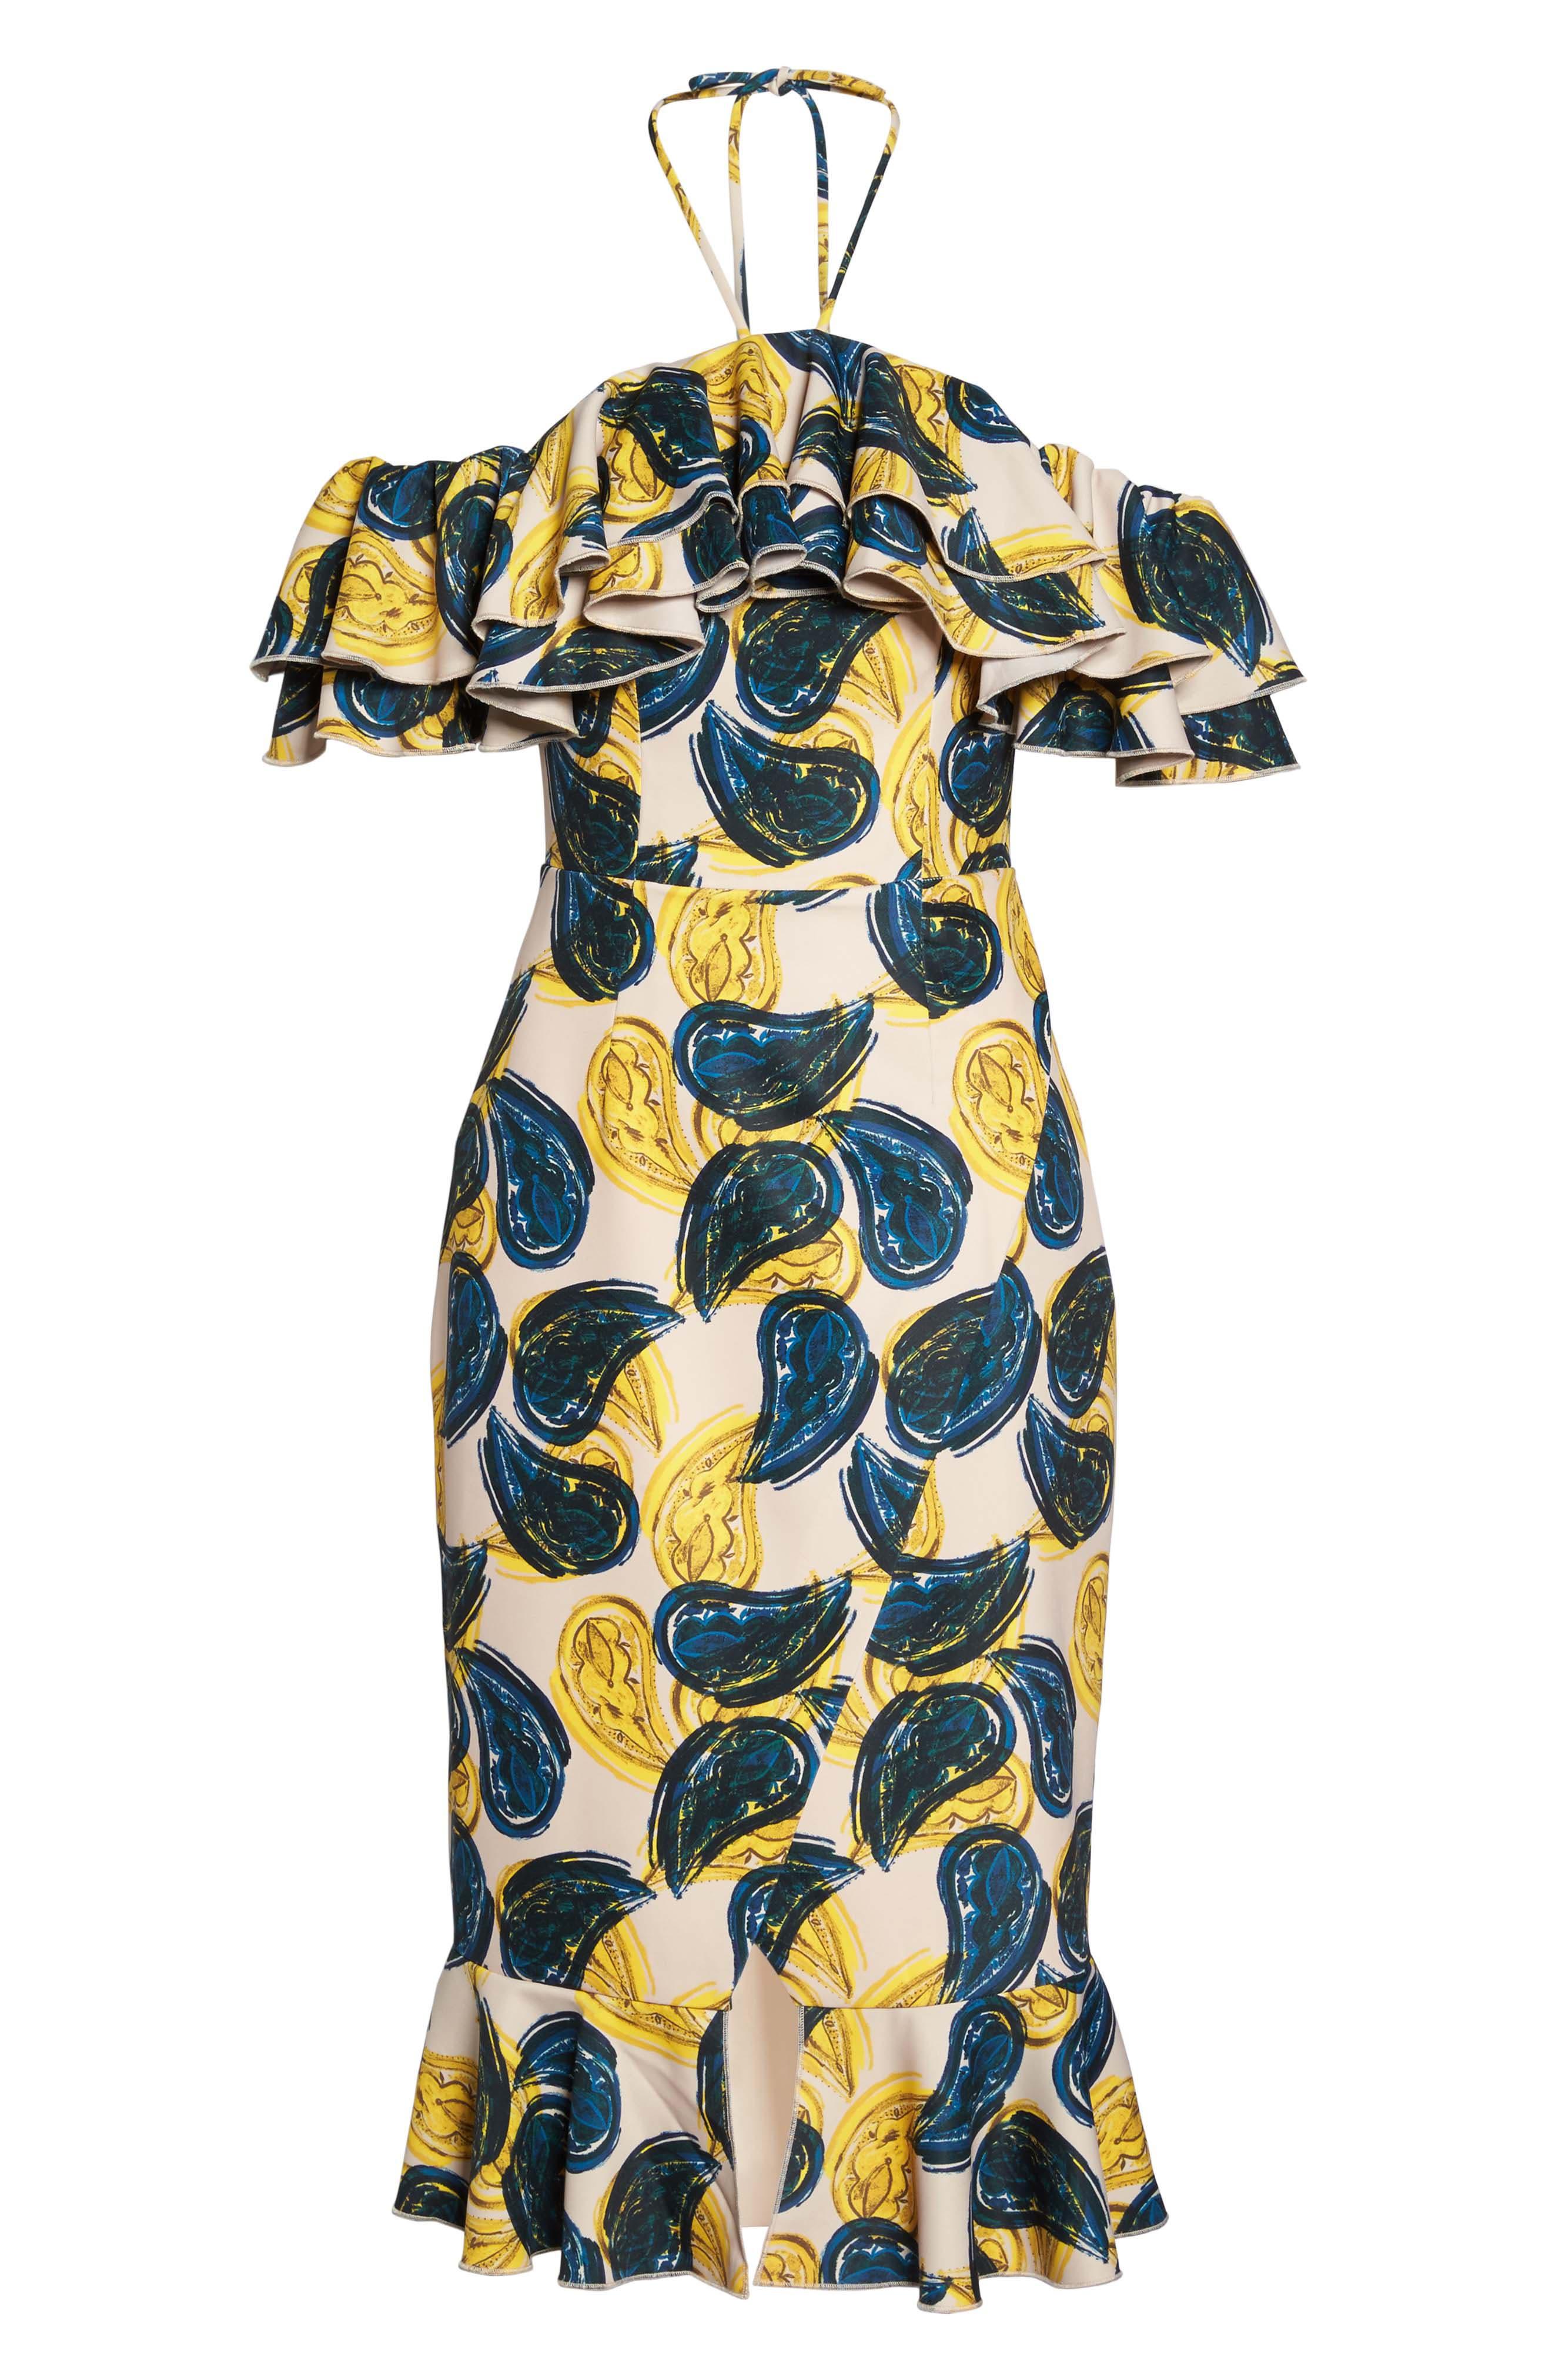 Temptation Halter Sheath Dress,                             Alternate thumbnail 7, color,                             Blush Paisley